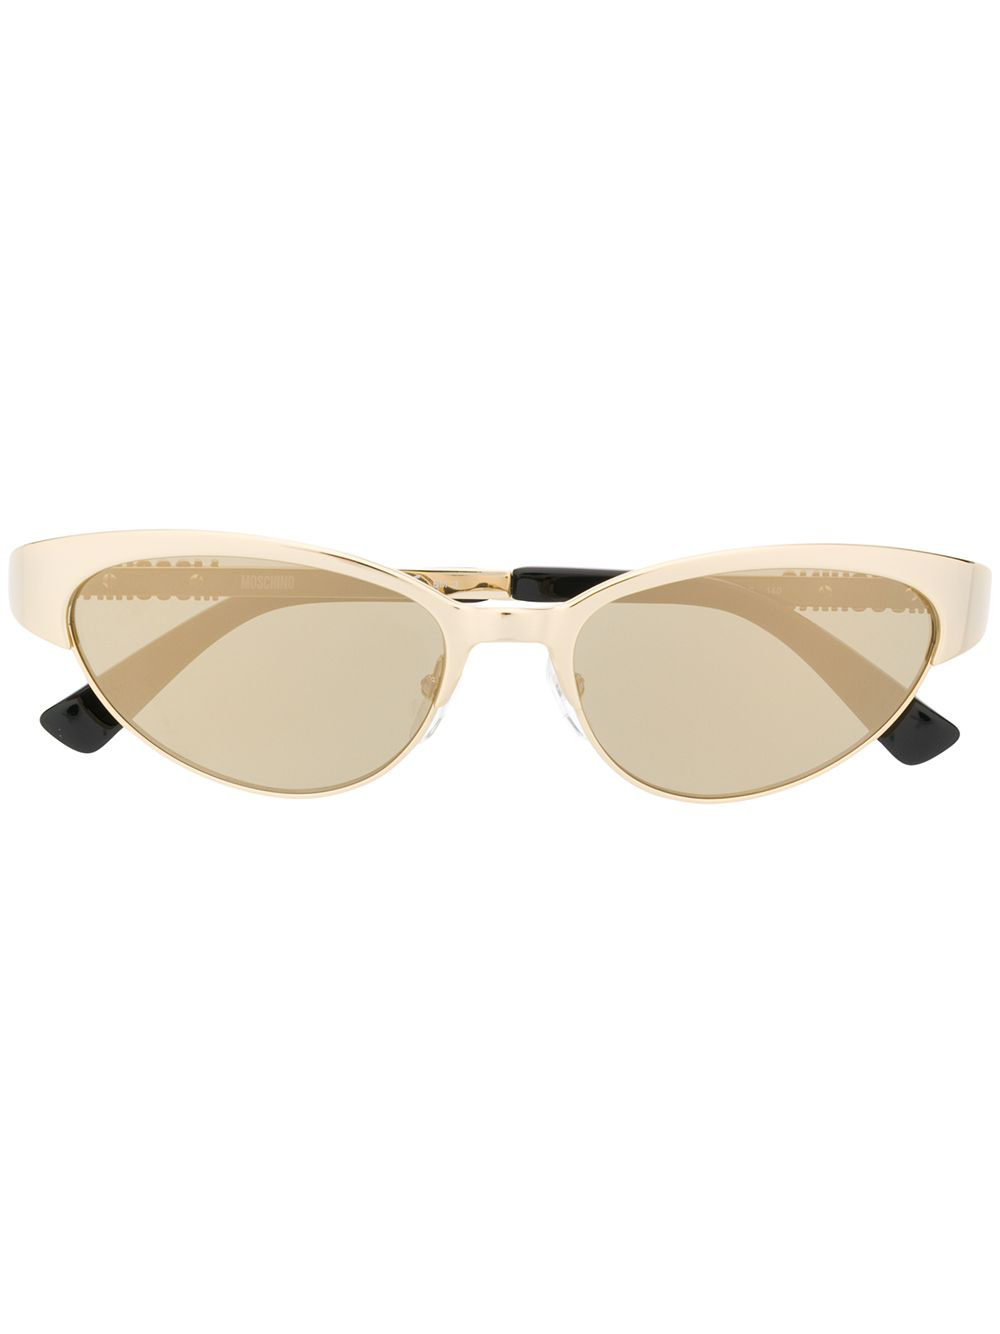 873ef944c793 Moschino Eyewear Cat Eye Sunglasses - Gold | ModeSens